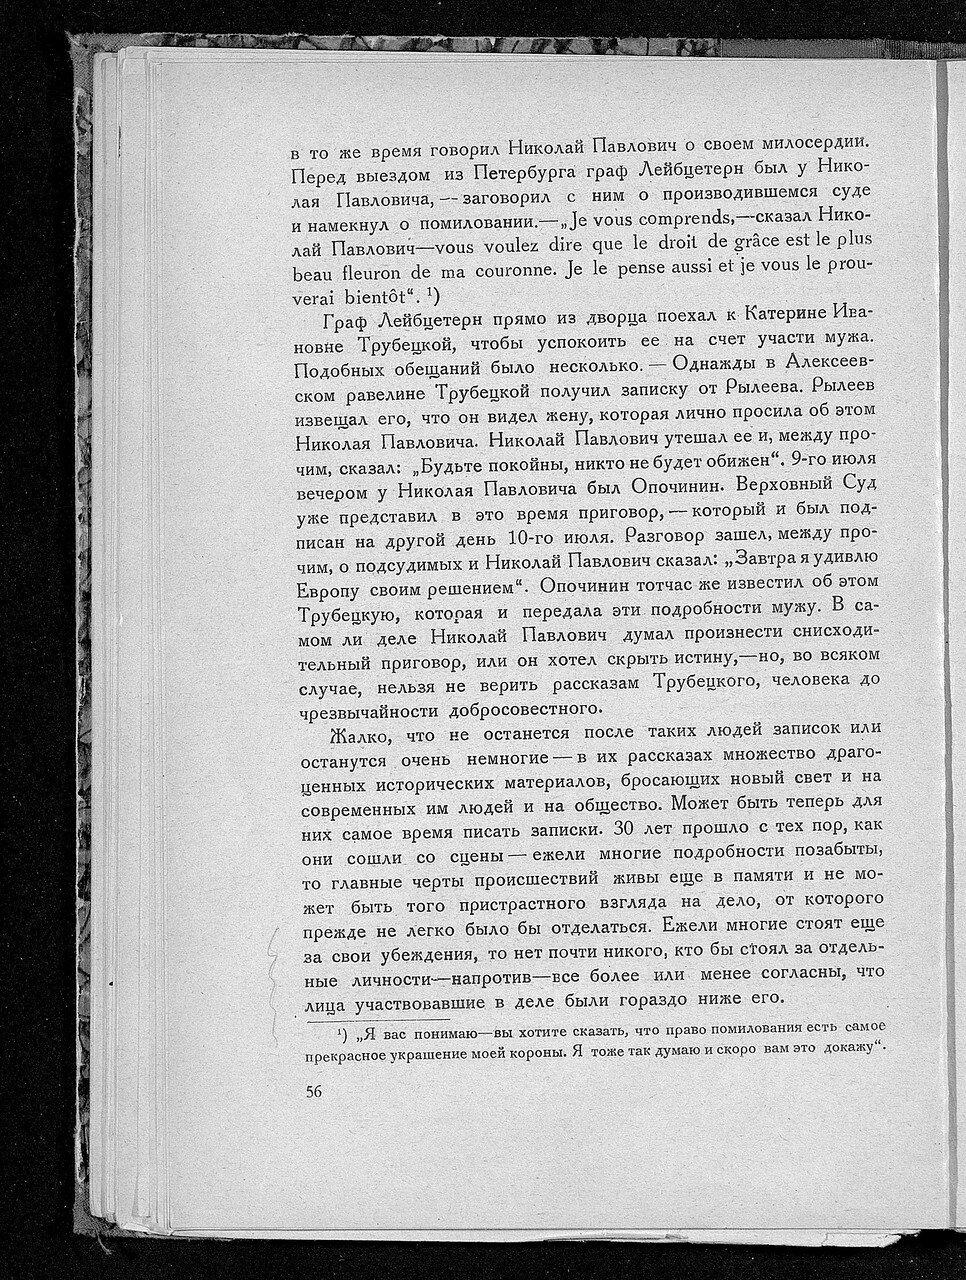 https://img-fotki.yandex.ru/get/516062/199368979.a1/0_214334_38c059da_XXXL.jpg